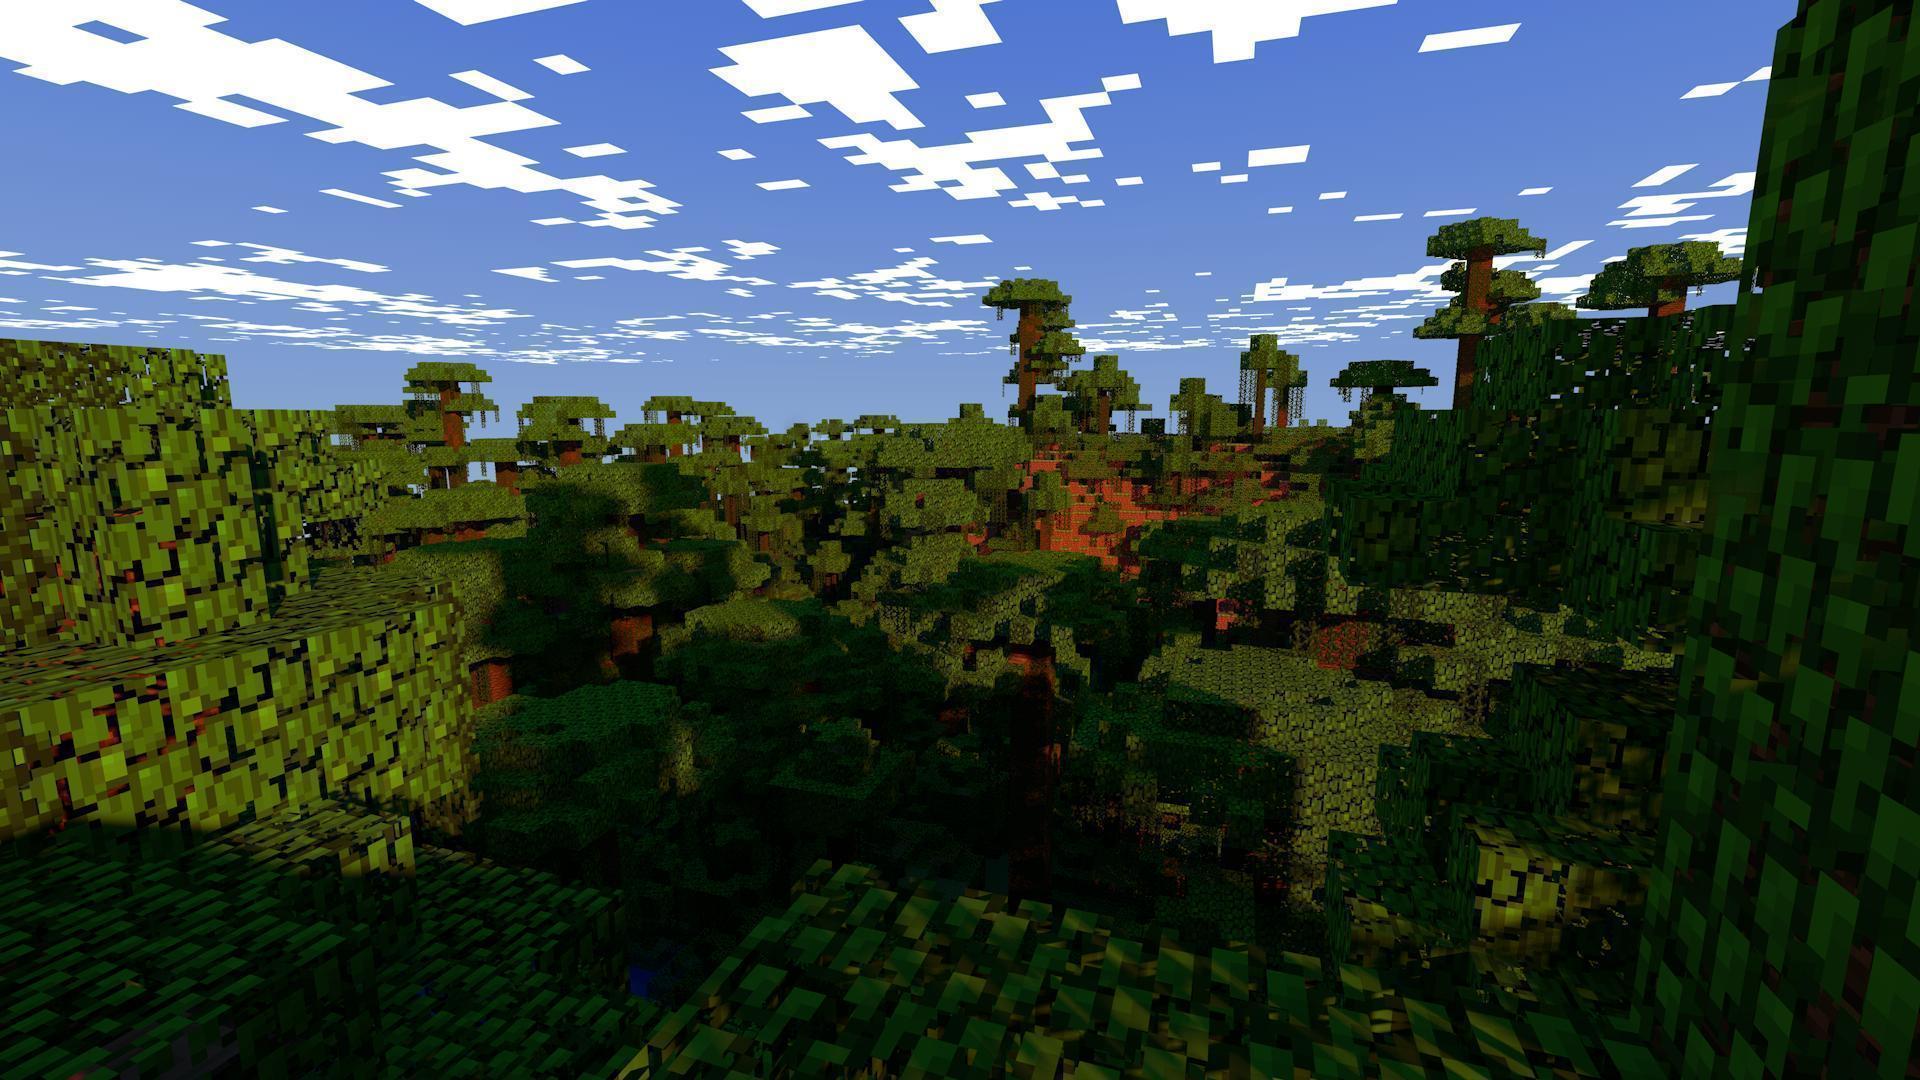 minecraft island wallpaper 1080p - photo #10